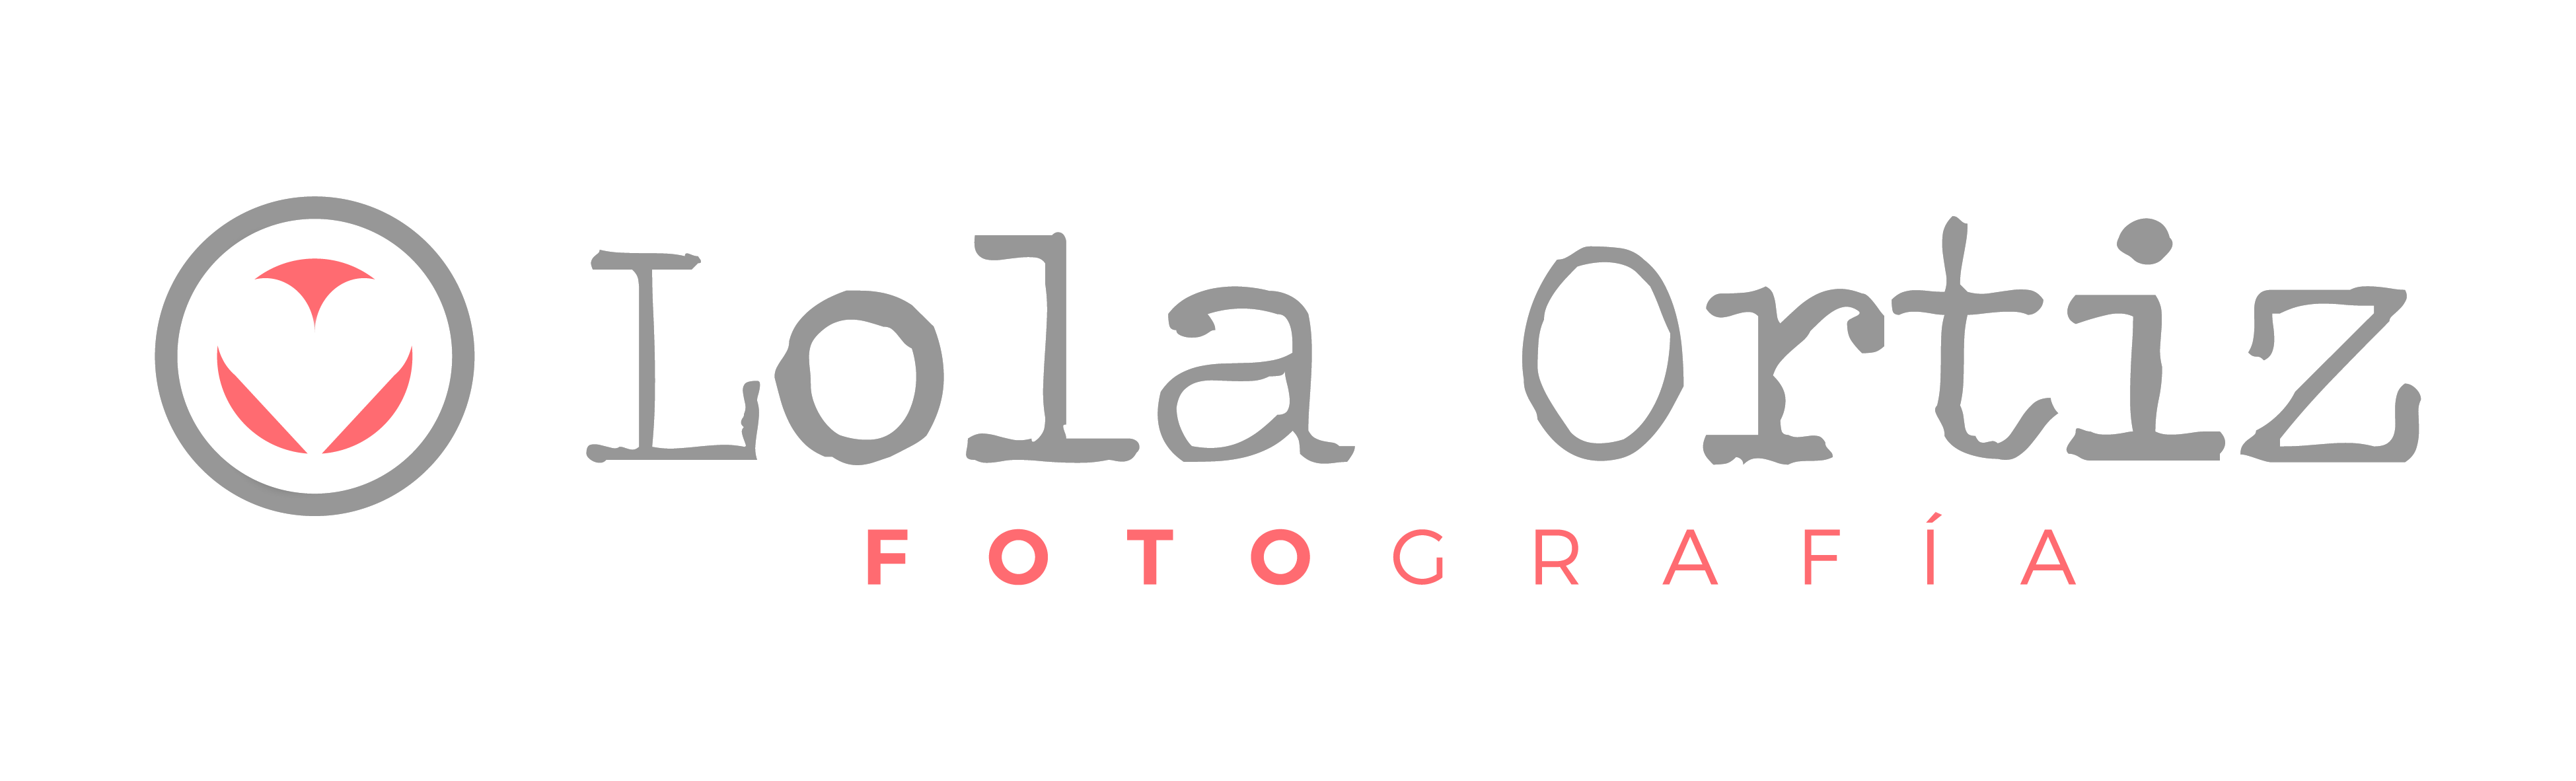 Lola Ortiz Foto